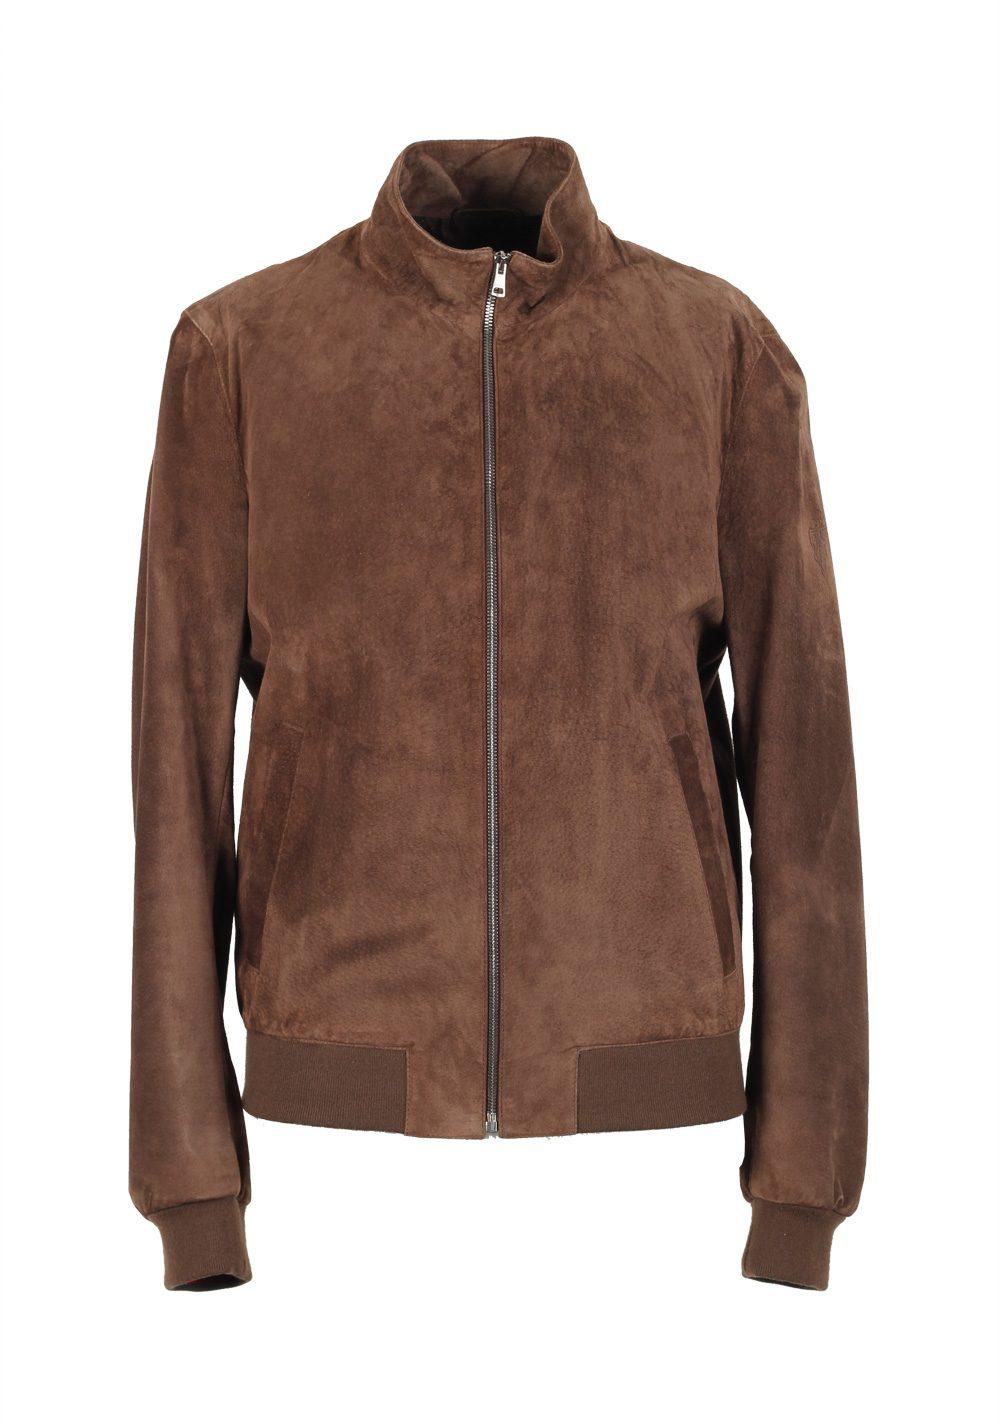 Gucci Brown Leather Bomber Jacket Coat Size 48   38R U.S.  d59e496a26d6